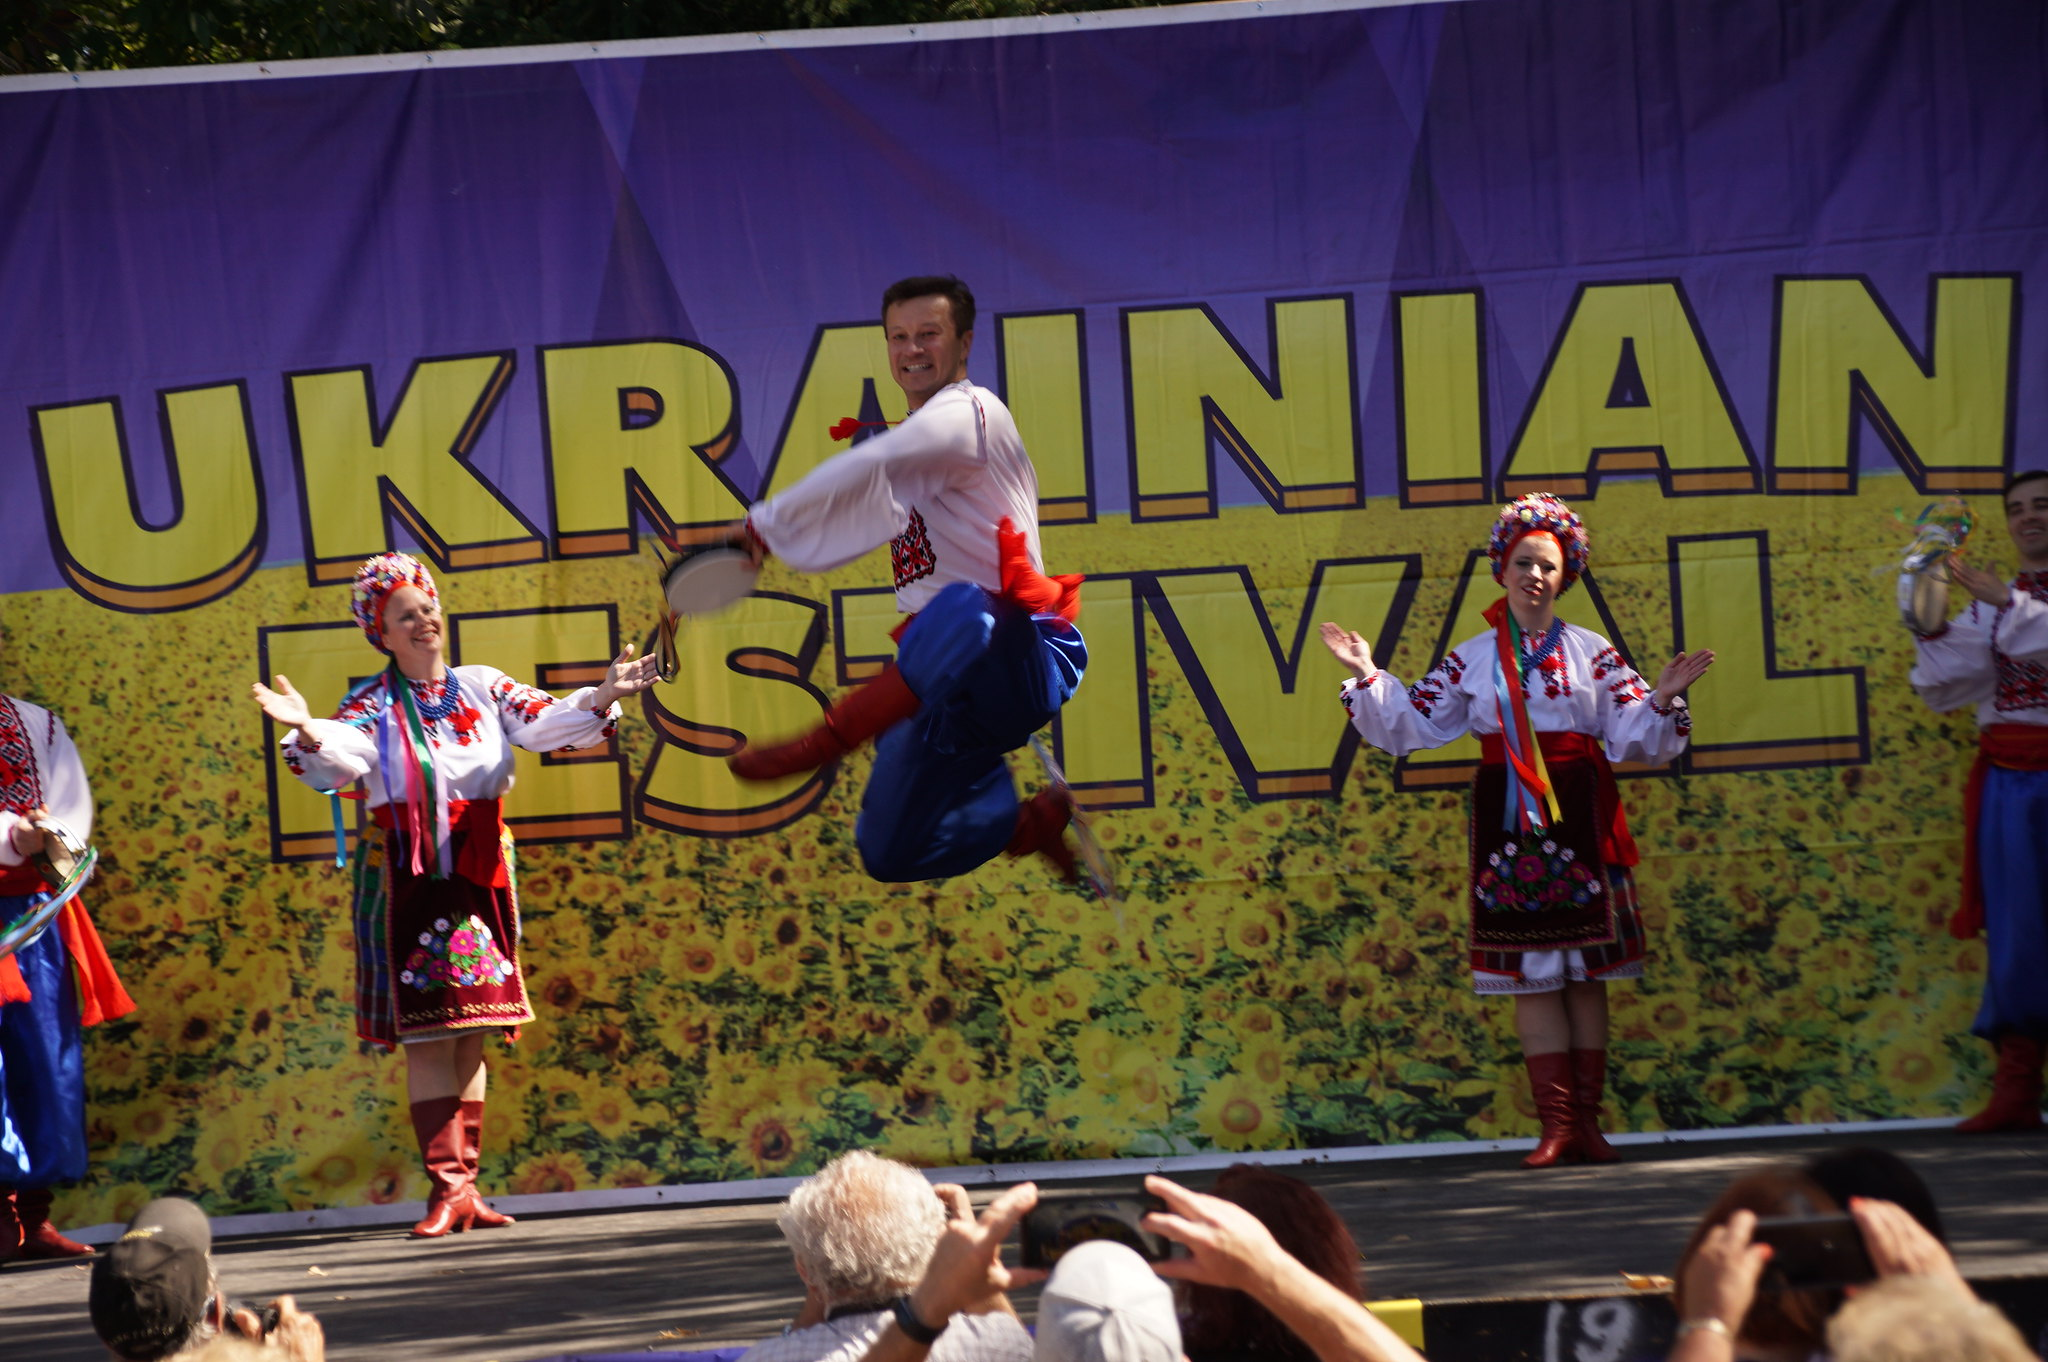 2019 Annual Ukrainian Festival